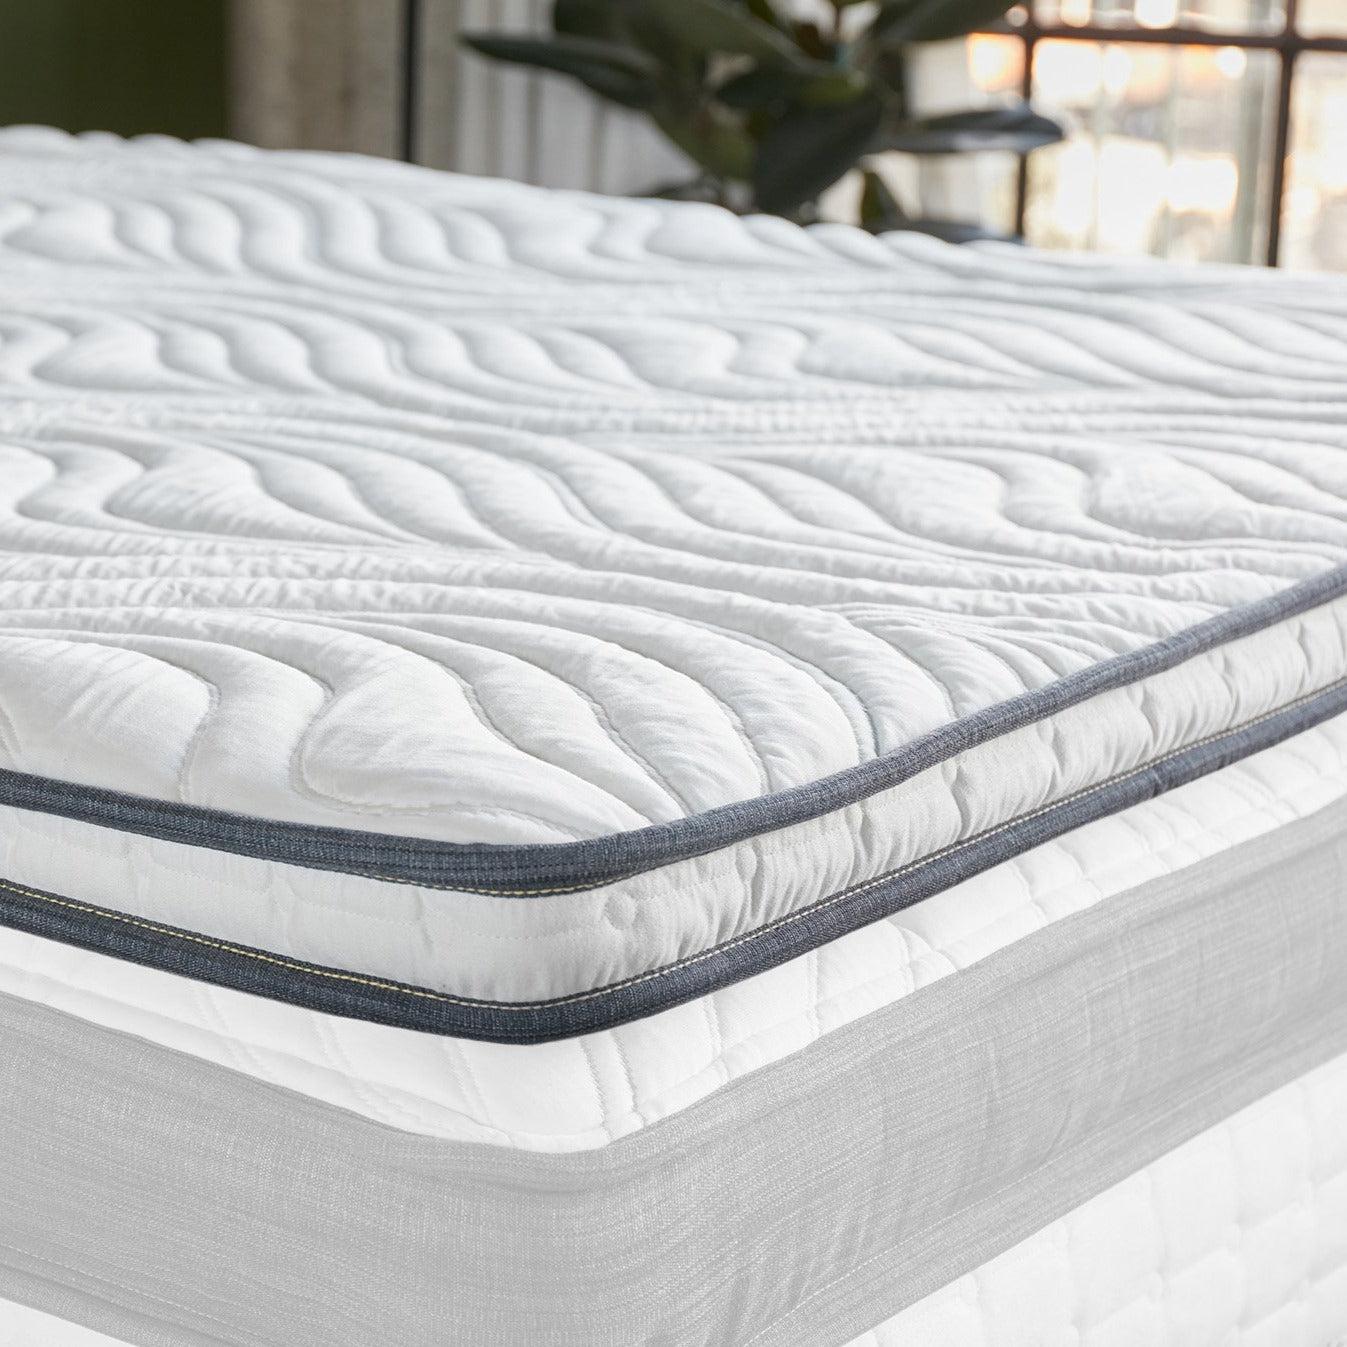 Memory Foam Mattress Topper: Oceano | Brentwood Home